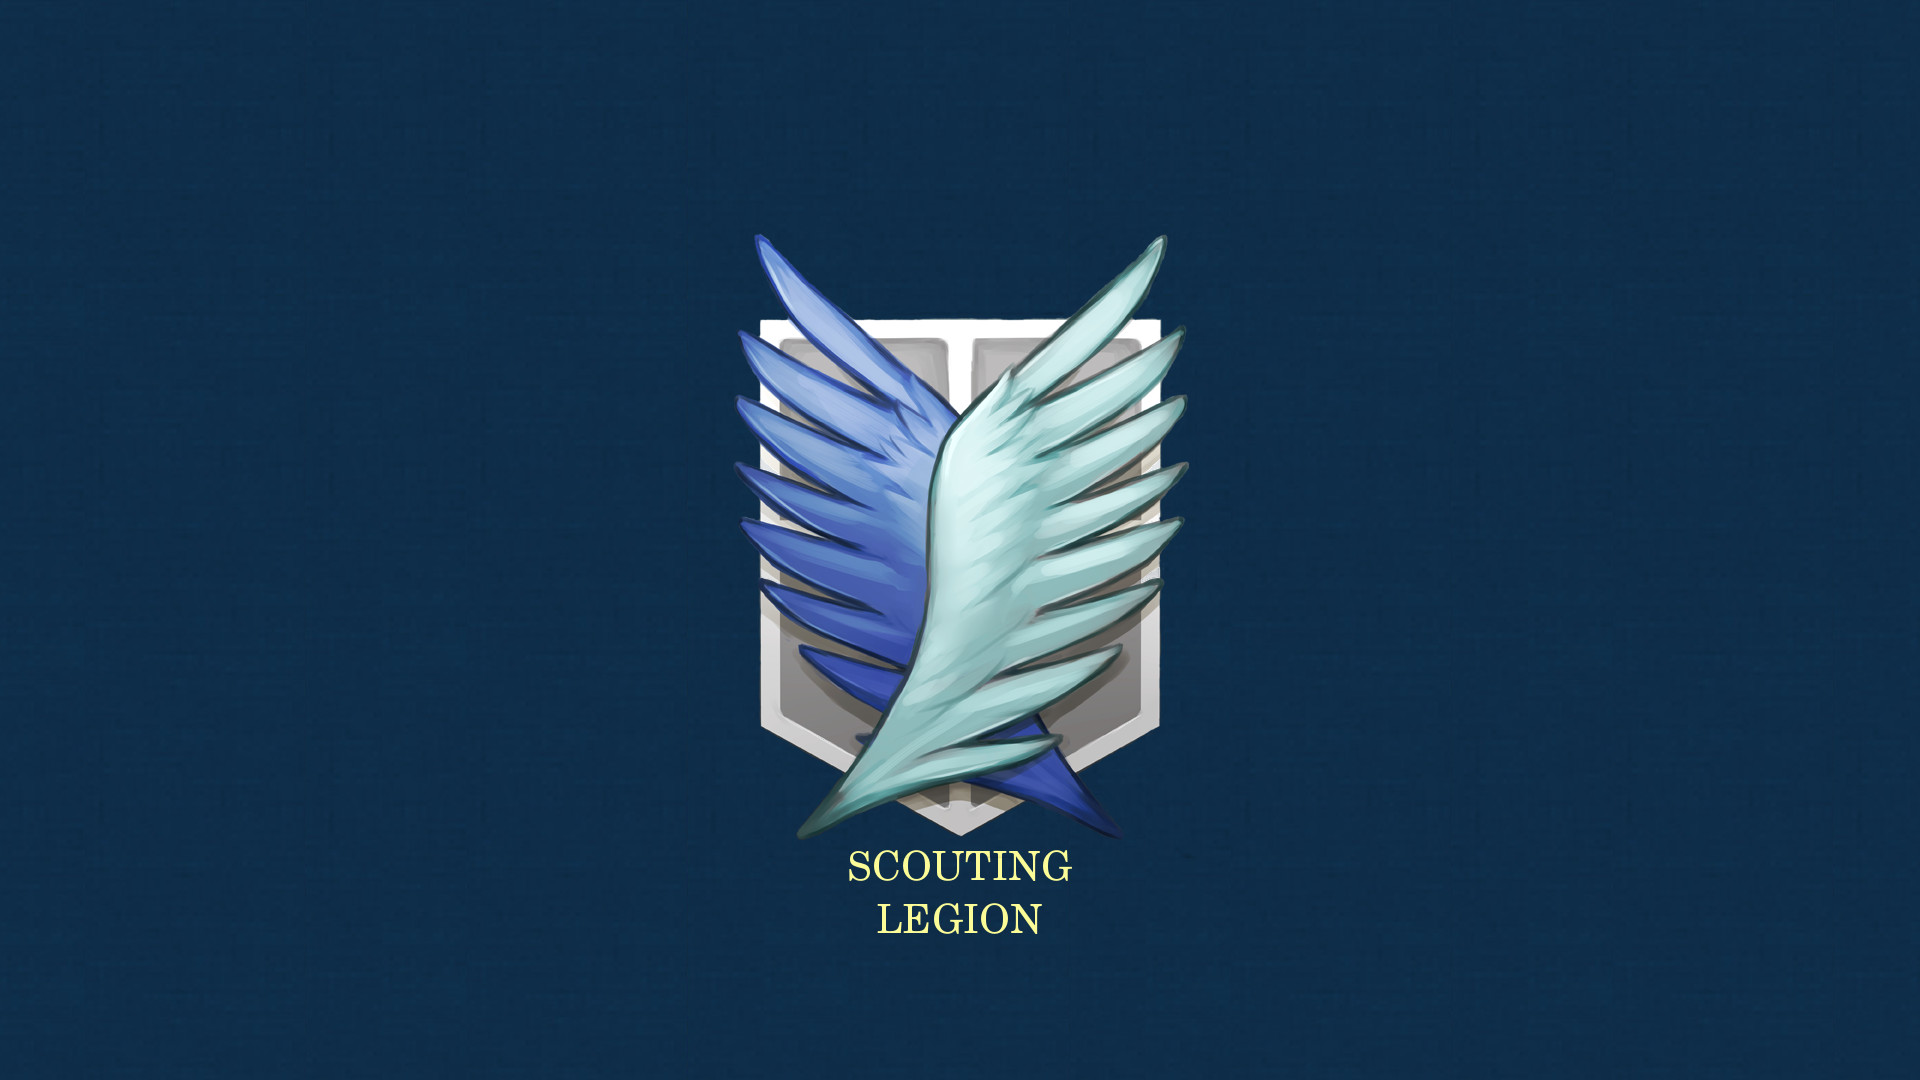 … Attack on Titan: Scouting Legion Wallpaper ReDux by Imxset21